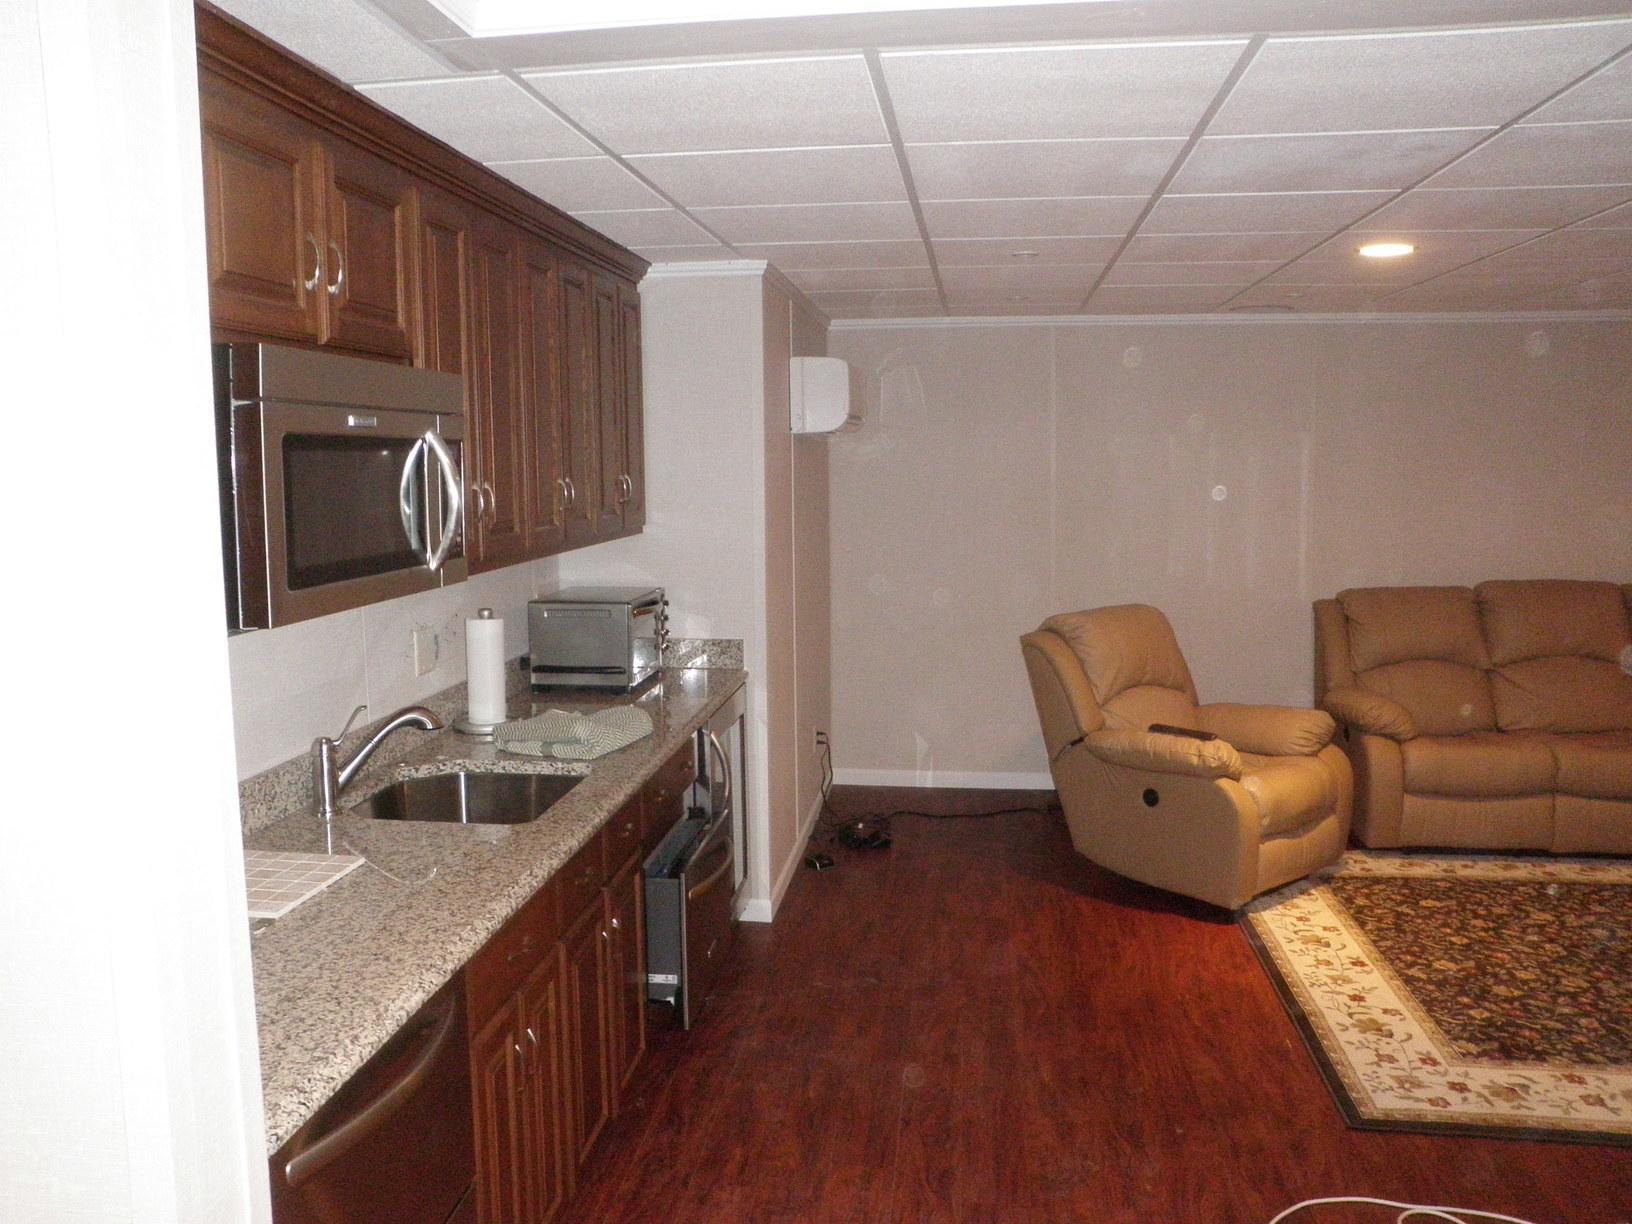 Restored basement in Middletown, Delaware - After Photo